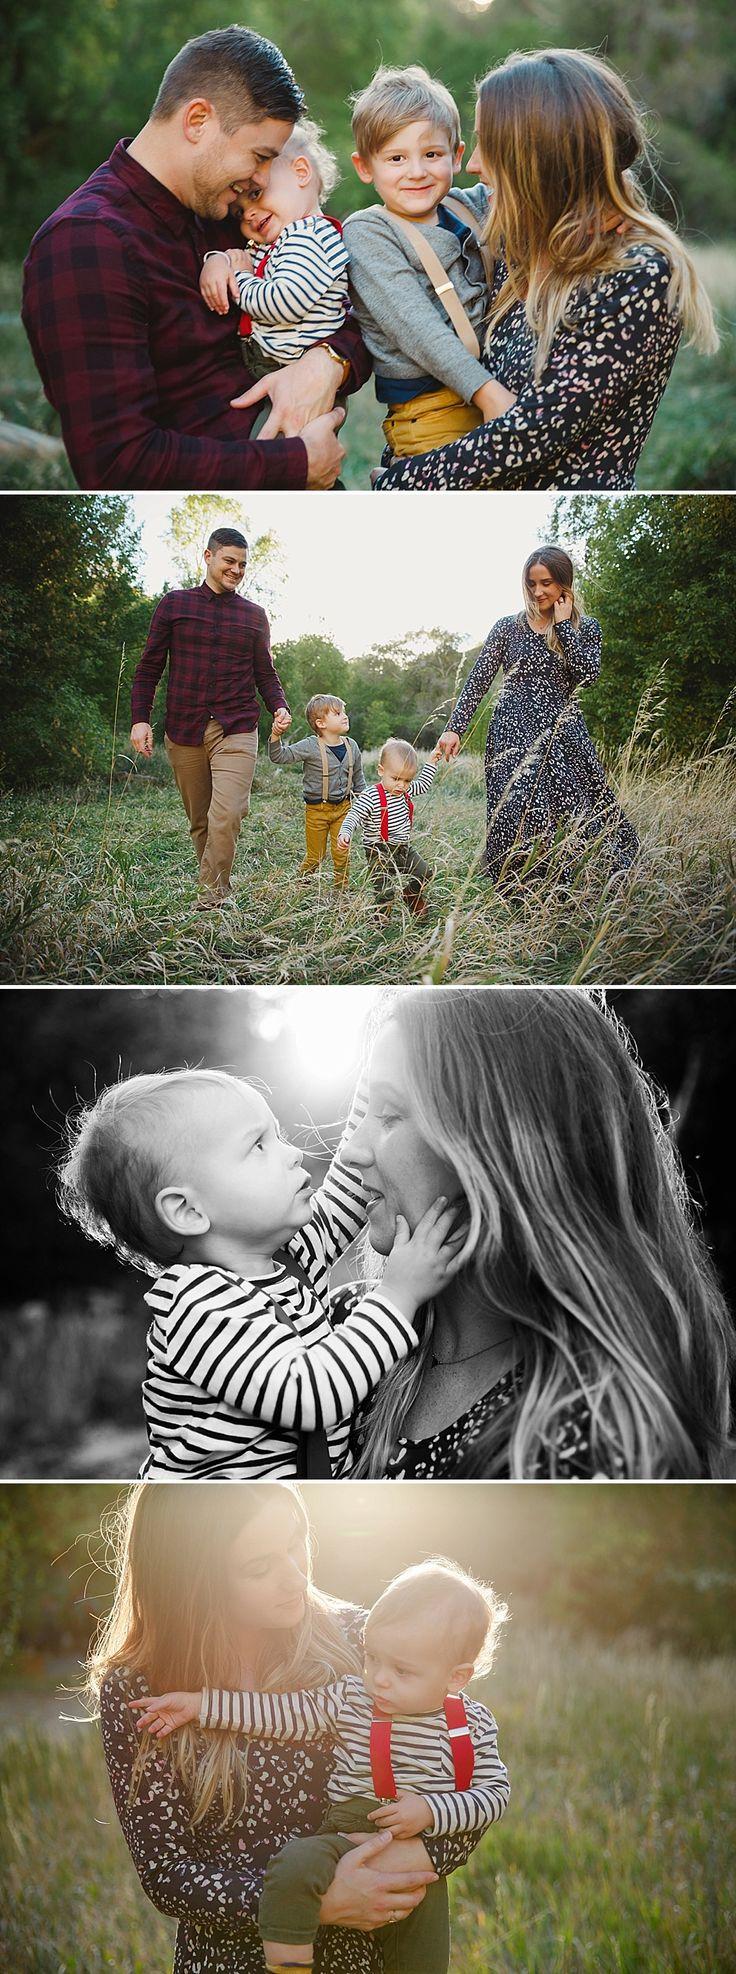 © Summer Murdock | Photographer Salt Lake City Area Family Photographer